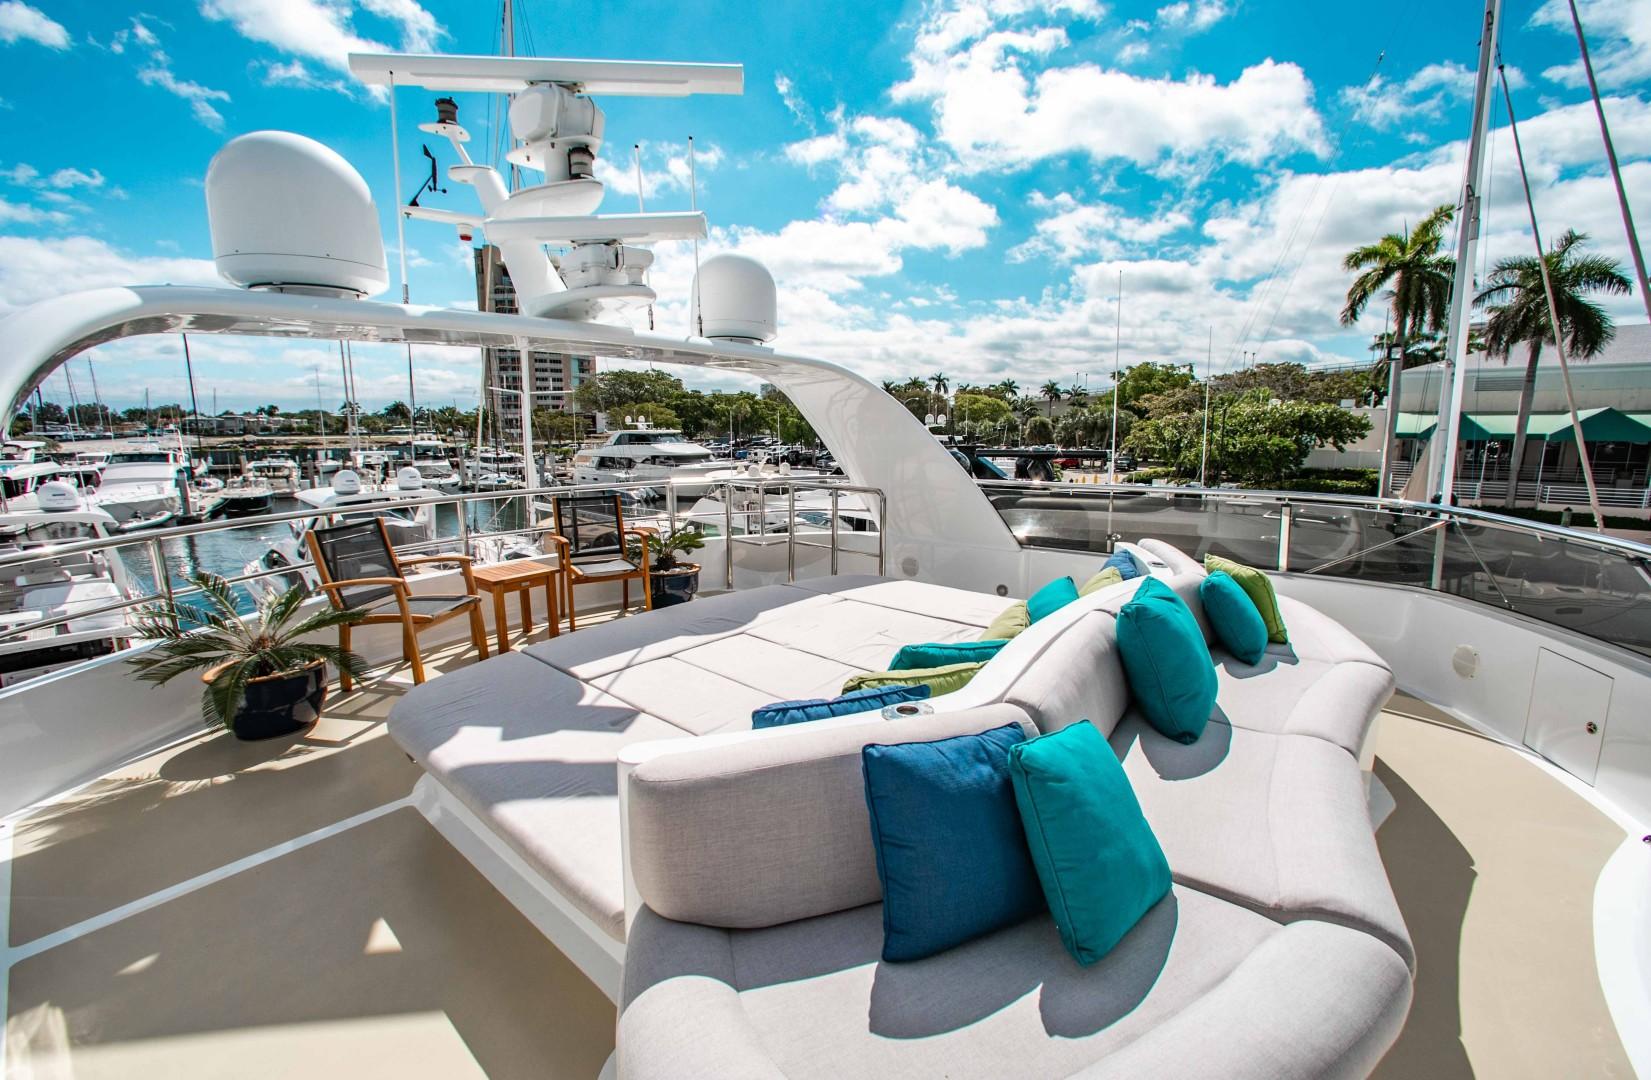 Conrad Shipyard-88 Motor Yacht 2005-Chillin Fort Lauderdale-Florida-United States-2000 Conrad Shipyard 88 Motor Yacht Chillin-1642510   Thumbnail